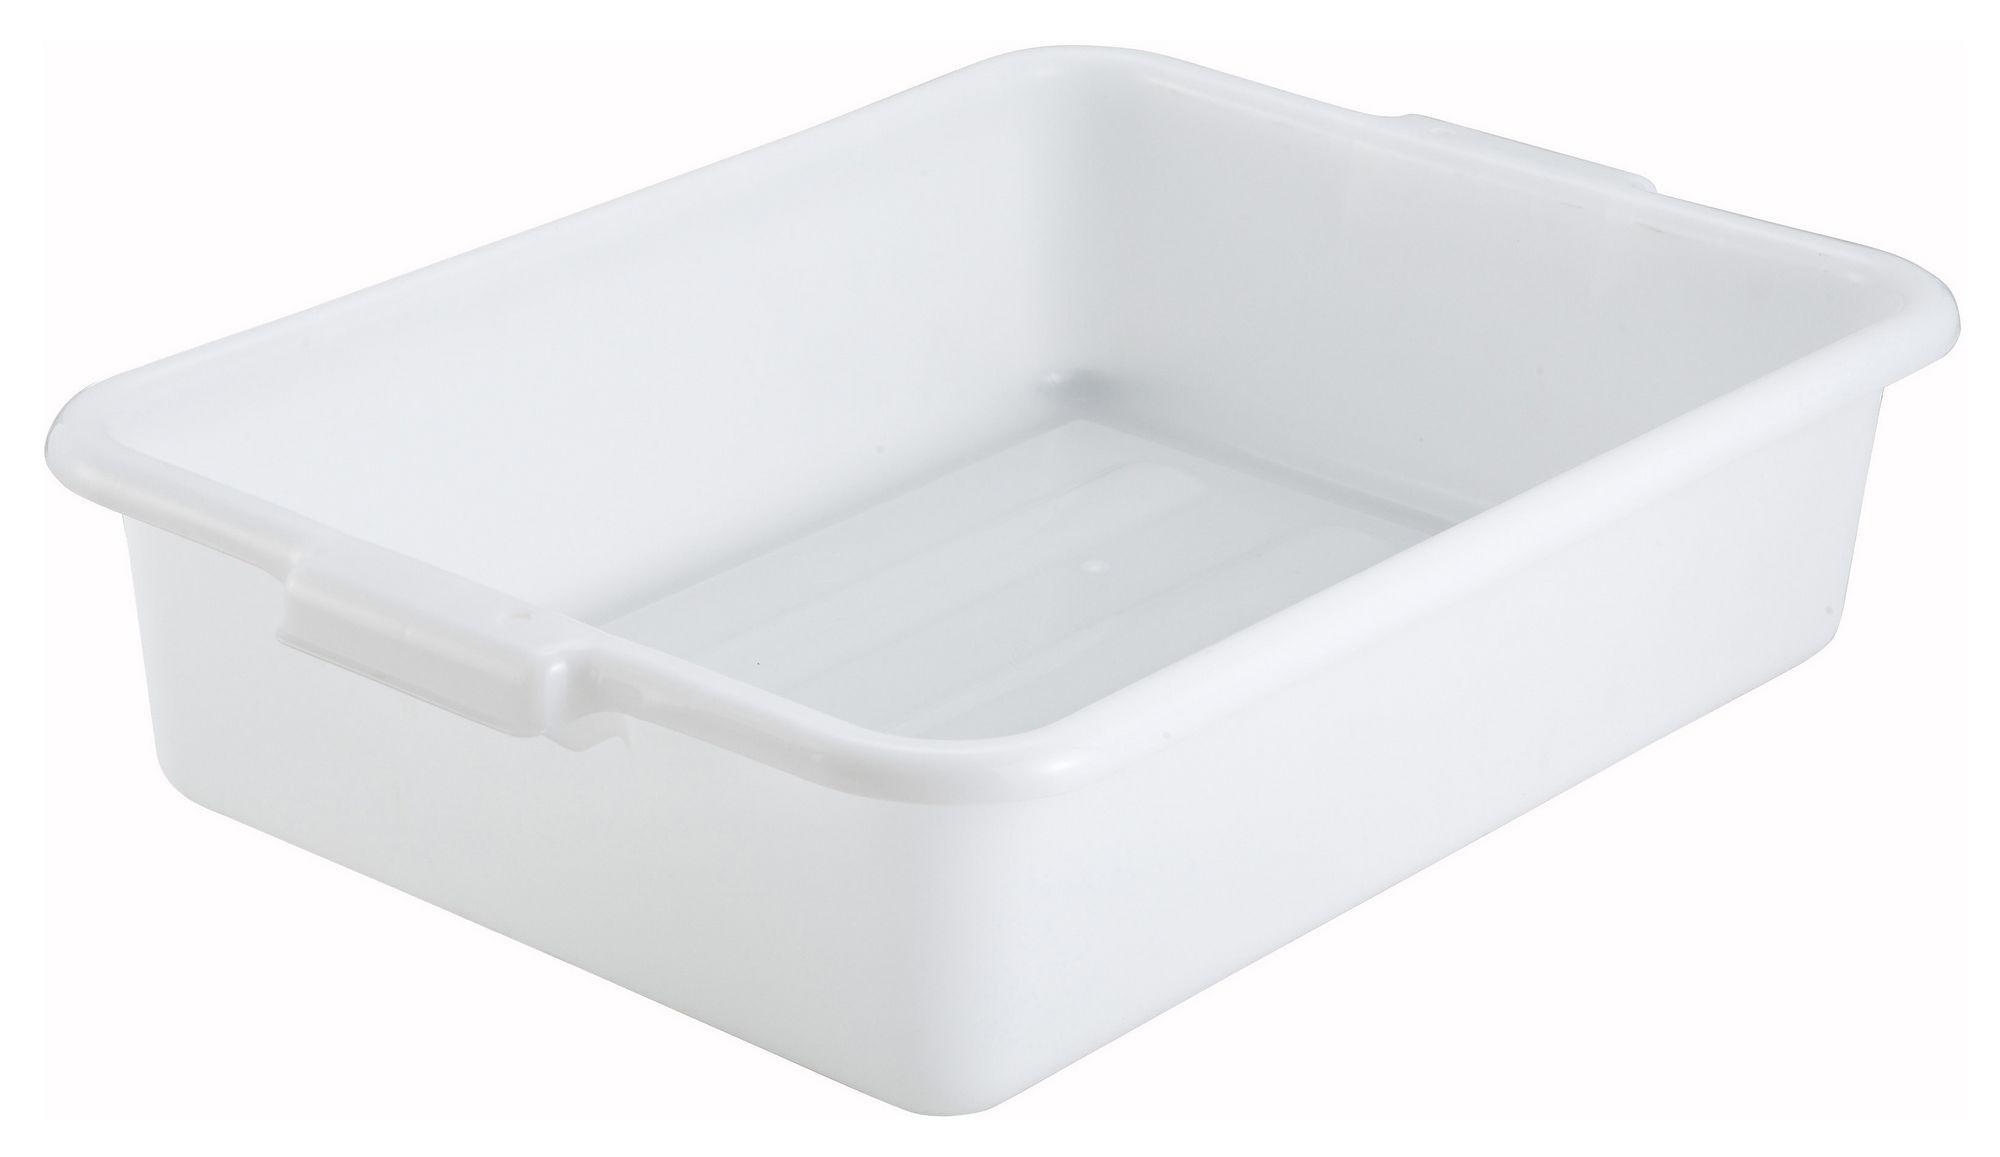 "Winco PL-5W White Dish Box 20-1/4"" x 15-1/2"" x 5"""